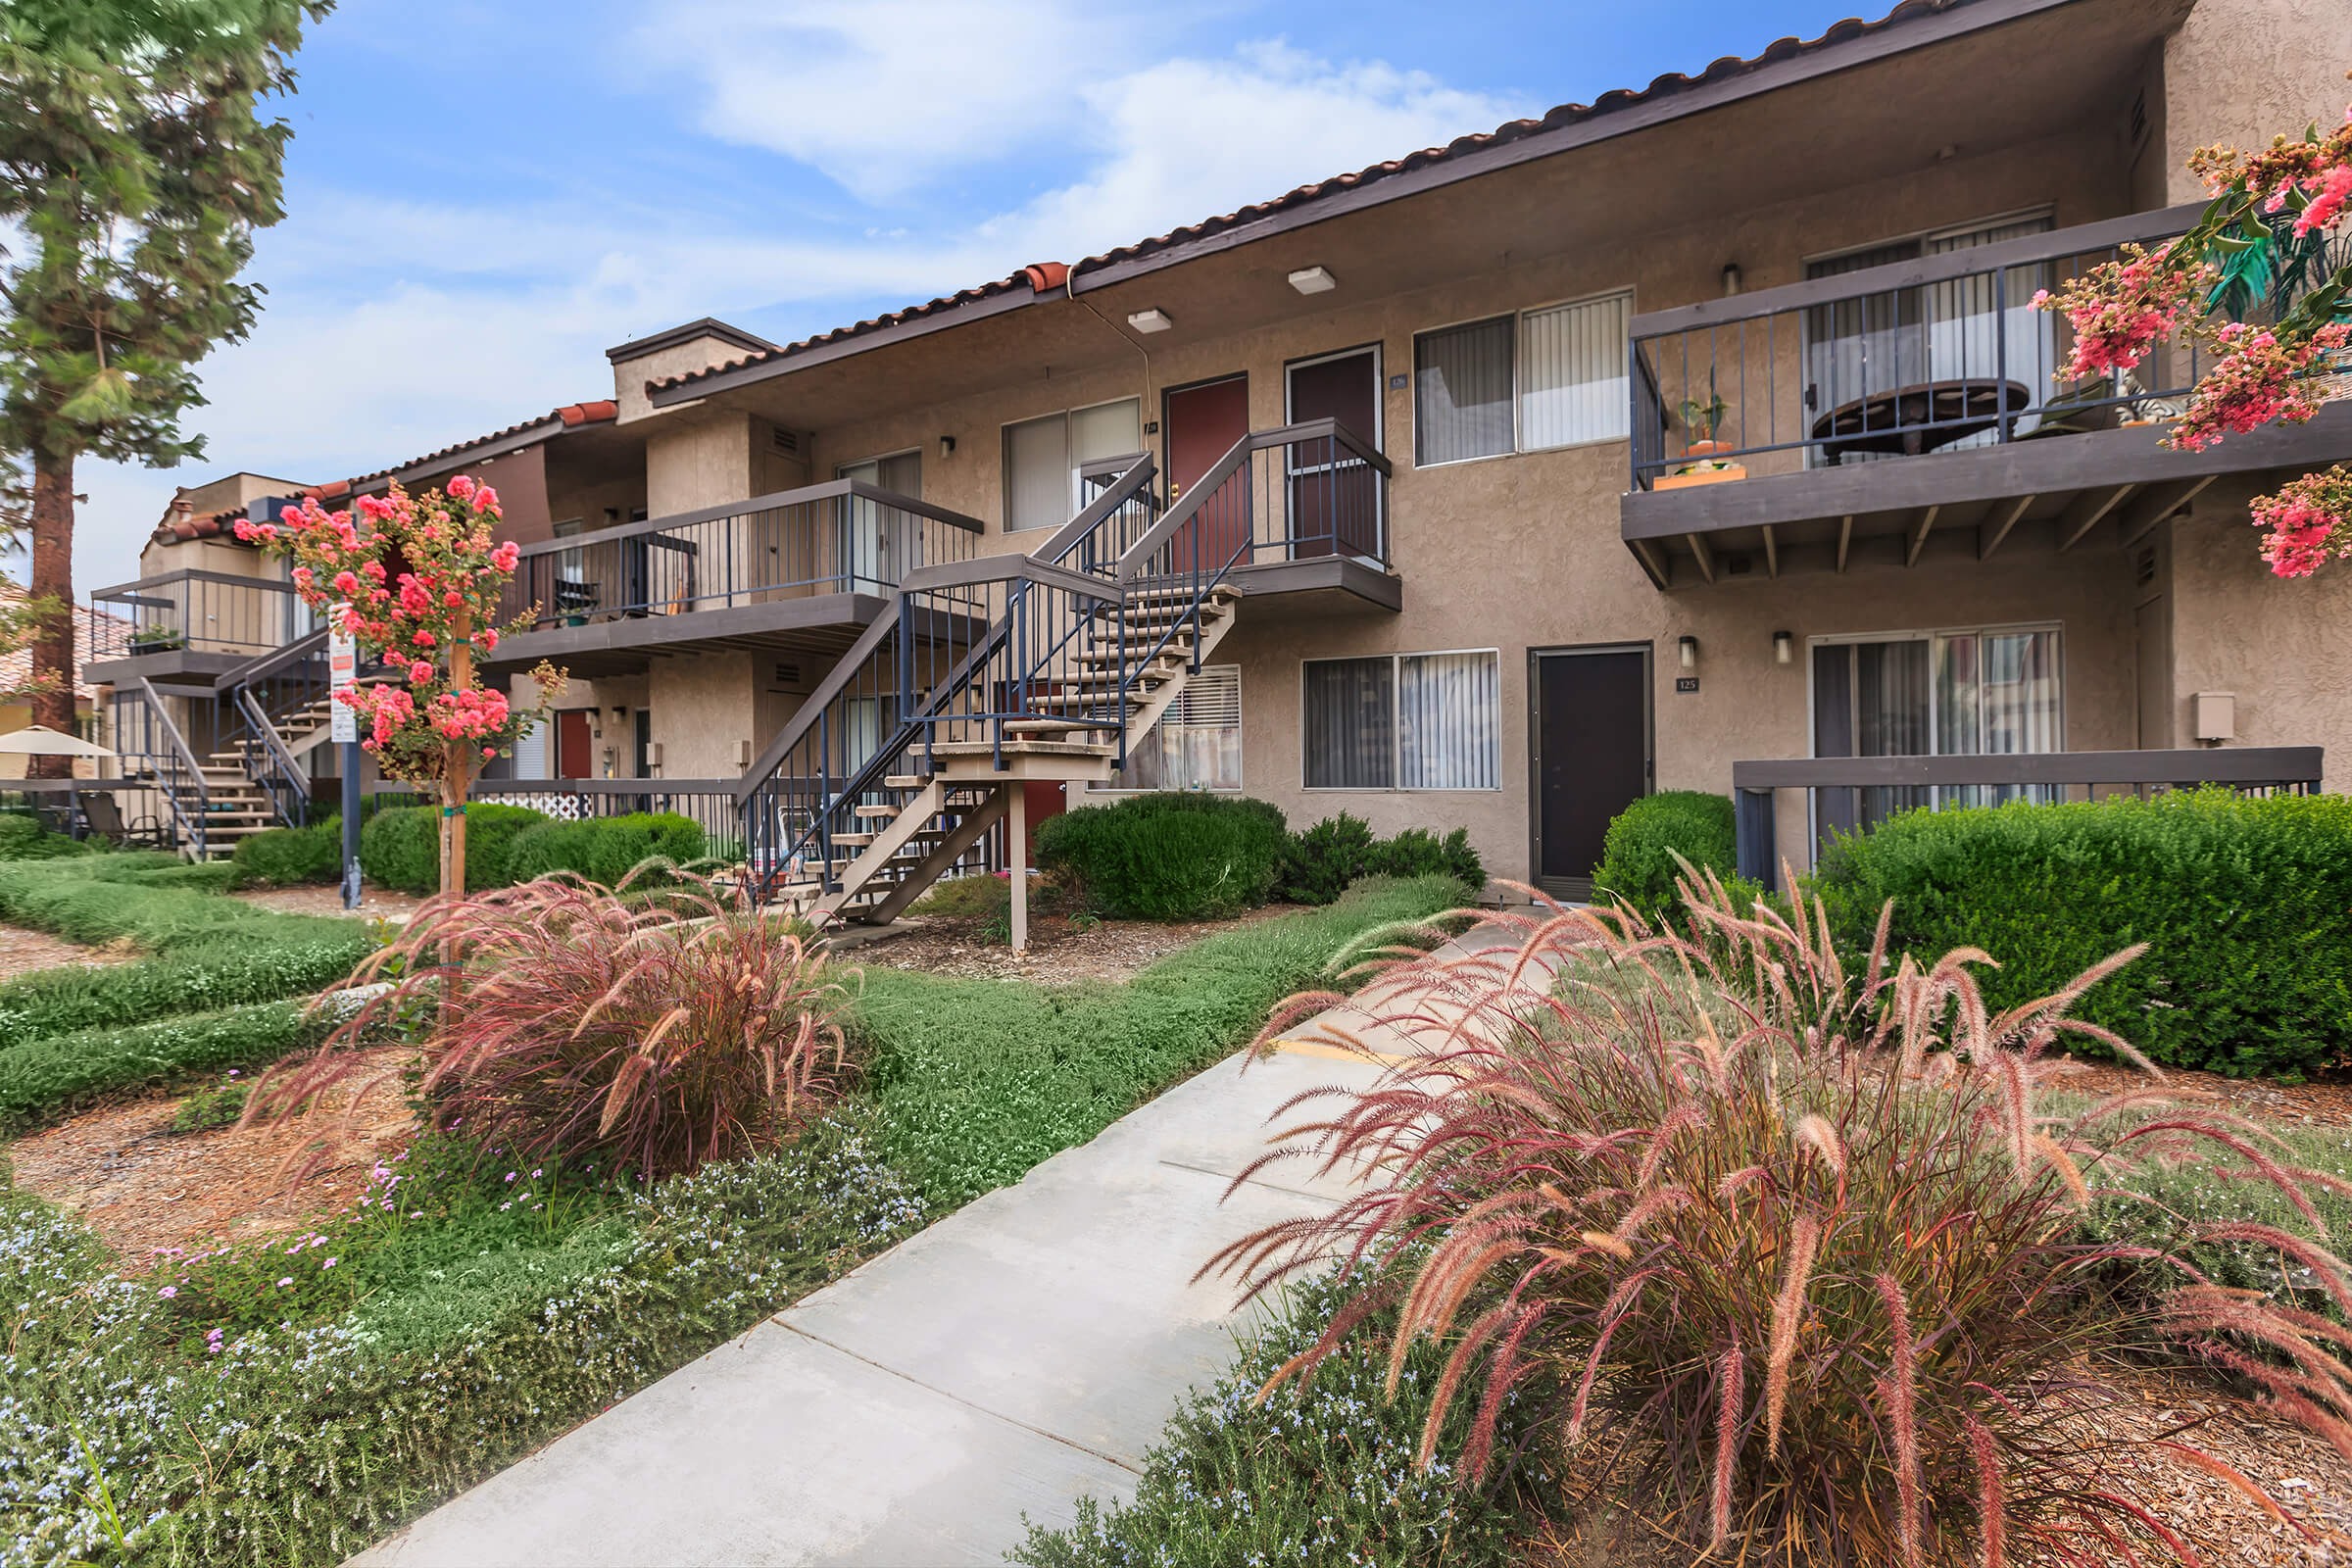 Picture of Villa Serena Senior Apartments